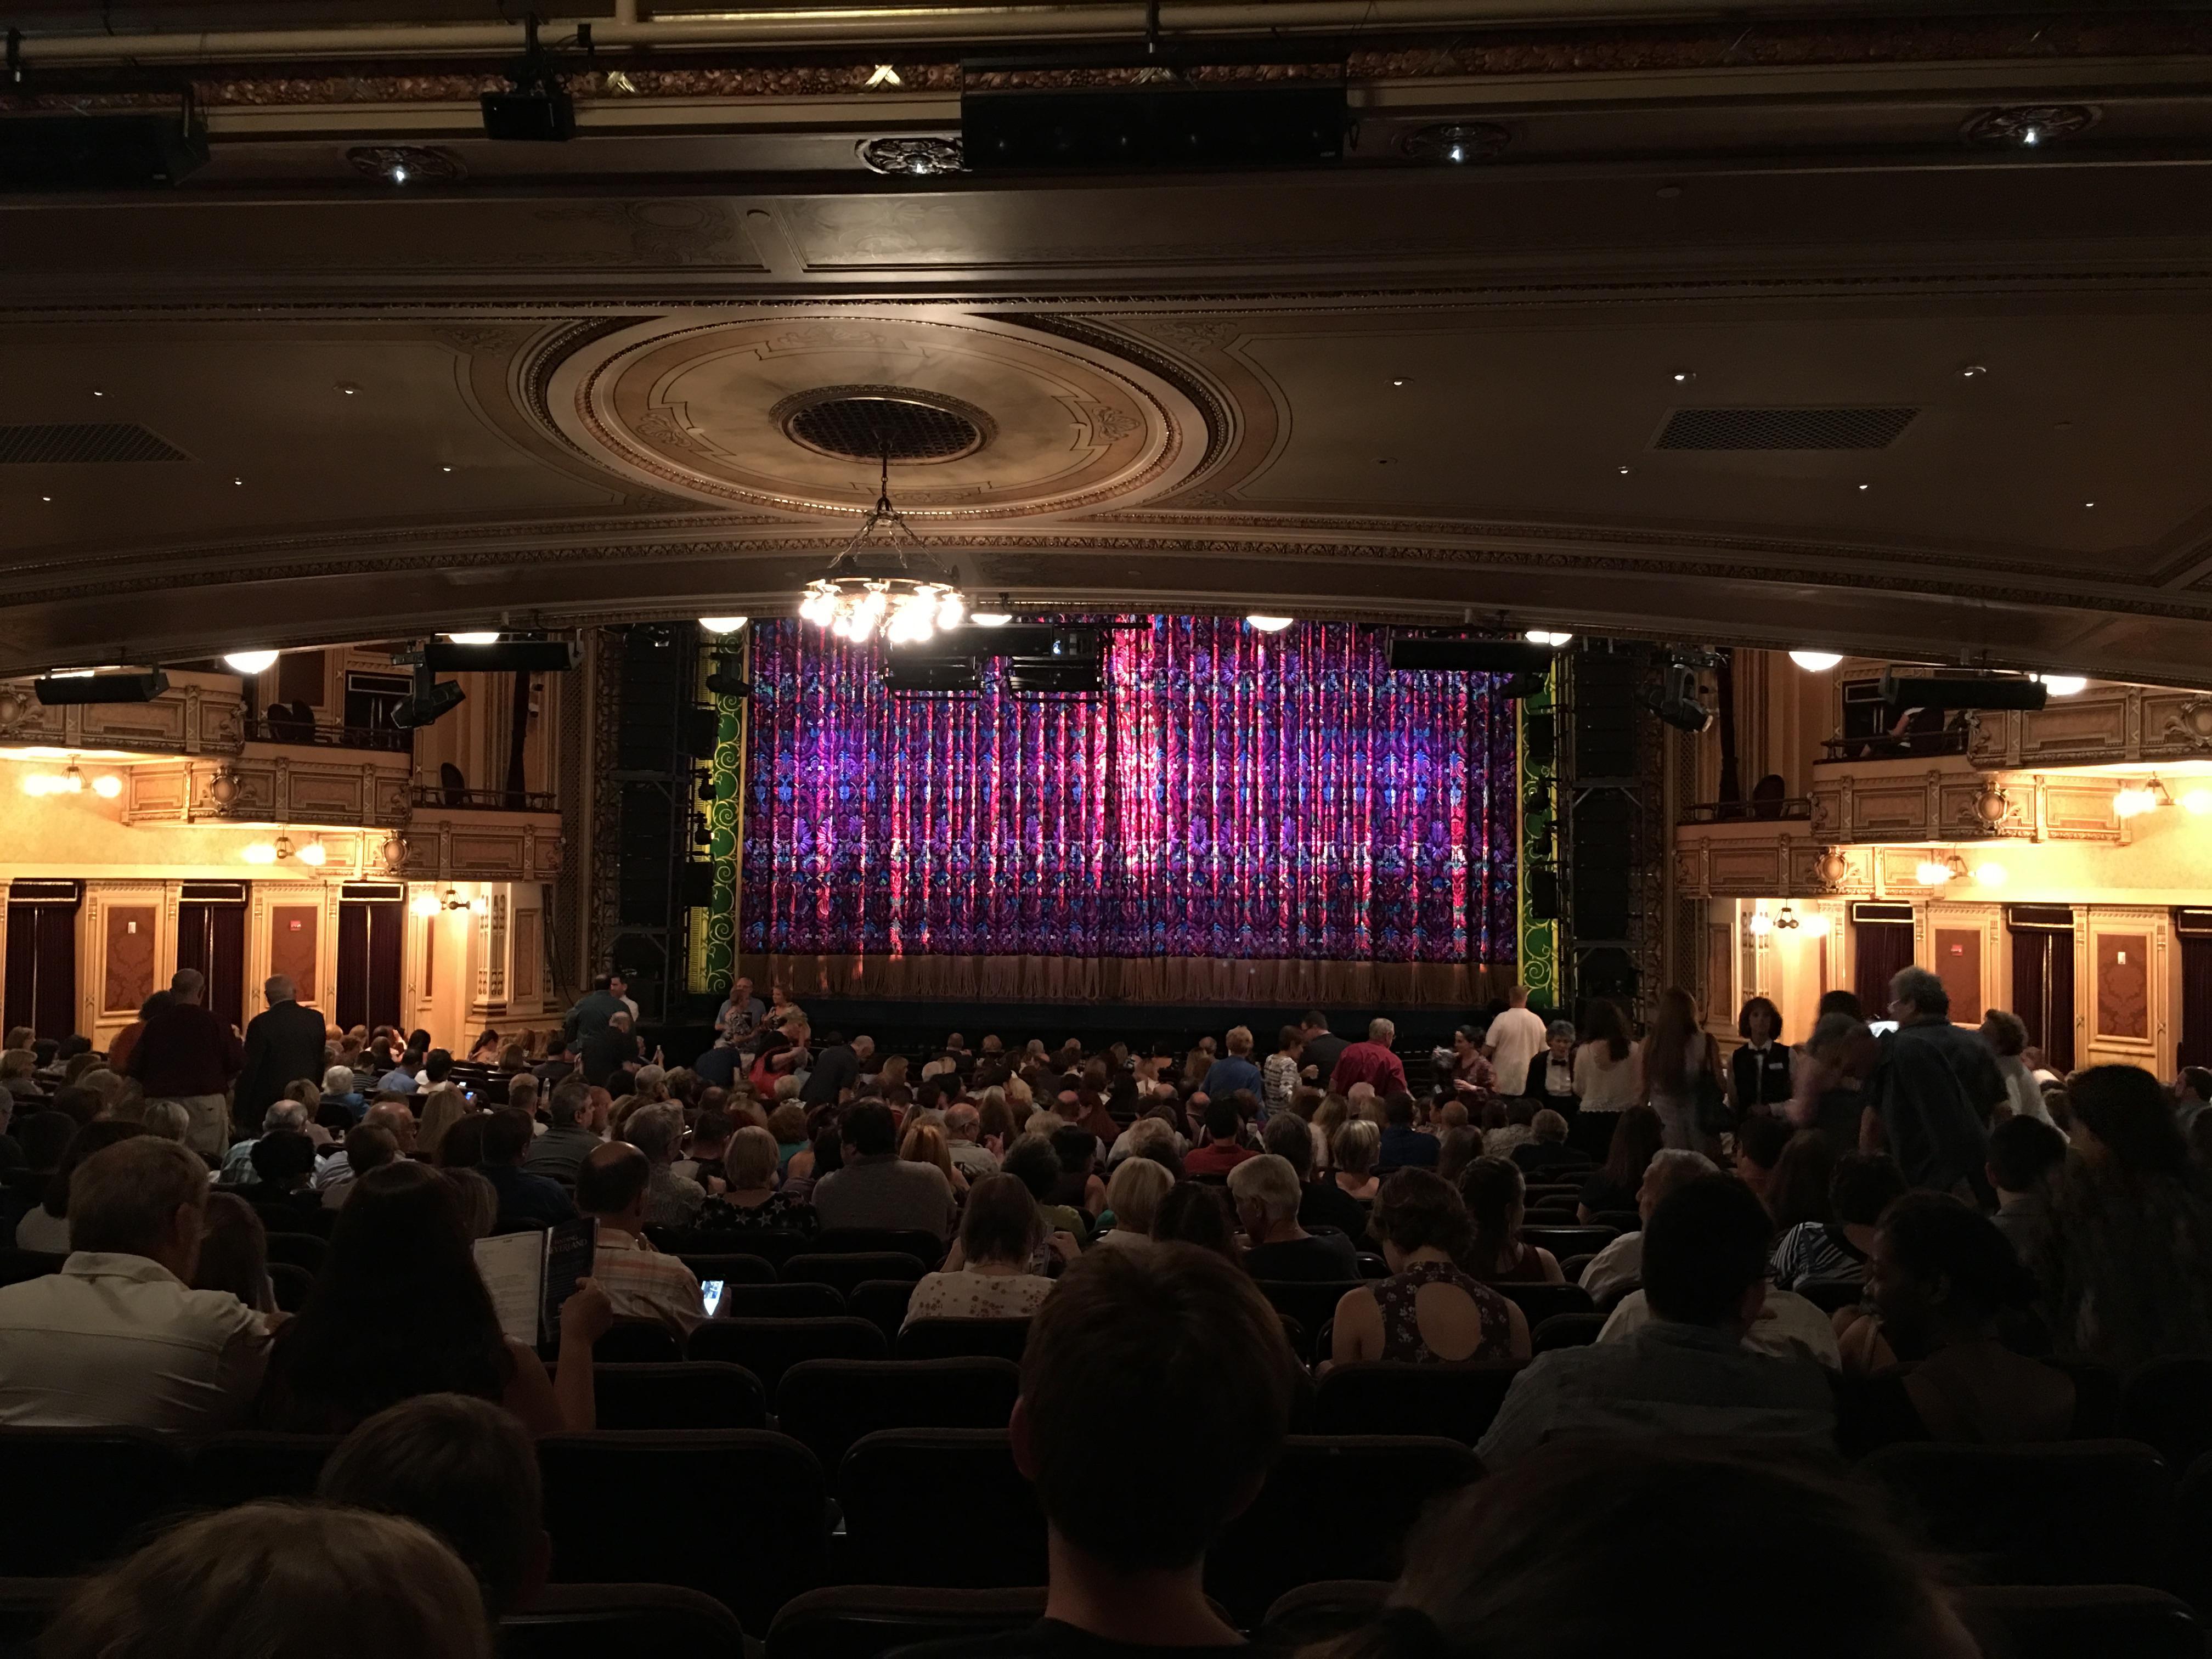 Hippodrome Theatre Section Center Orchestra Row CC Seat 113